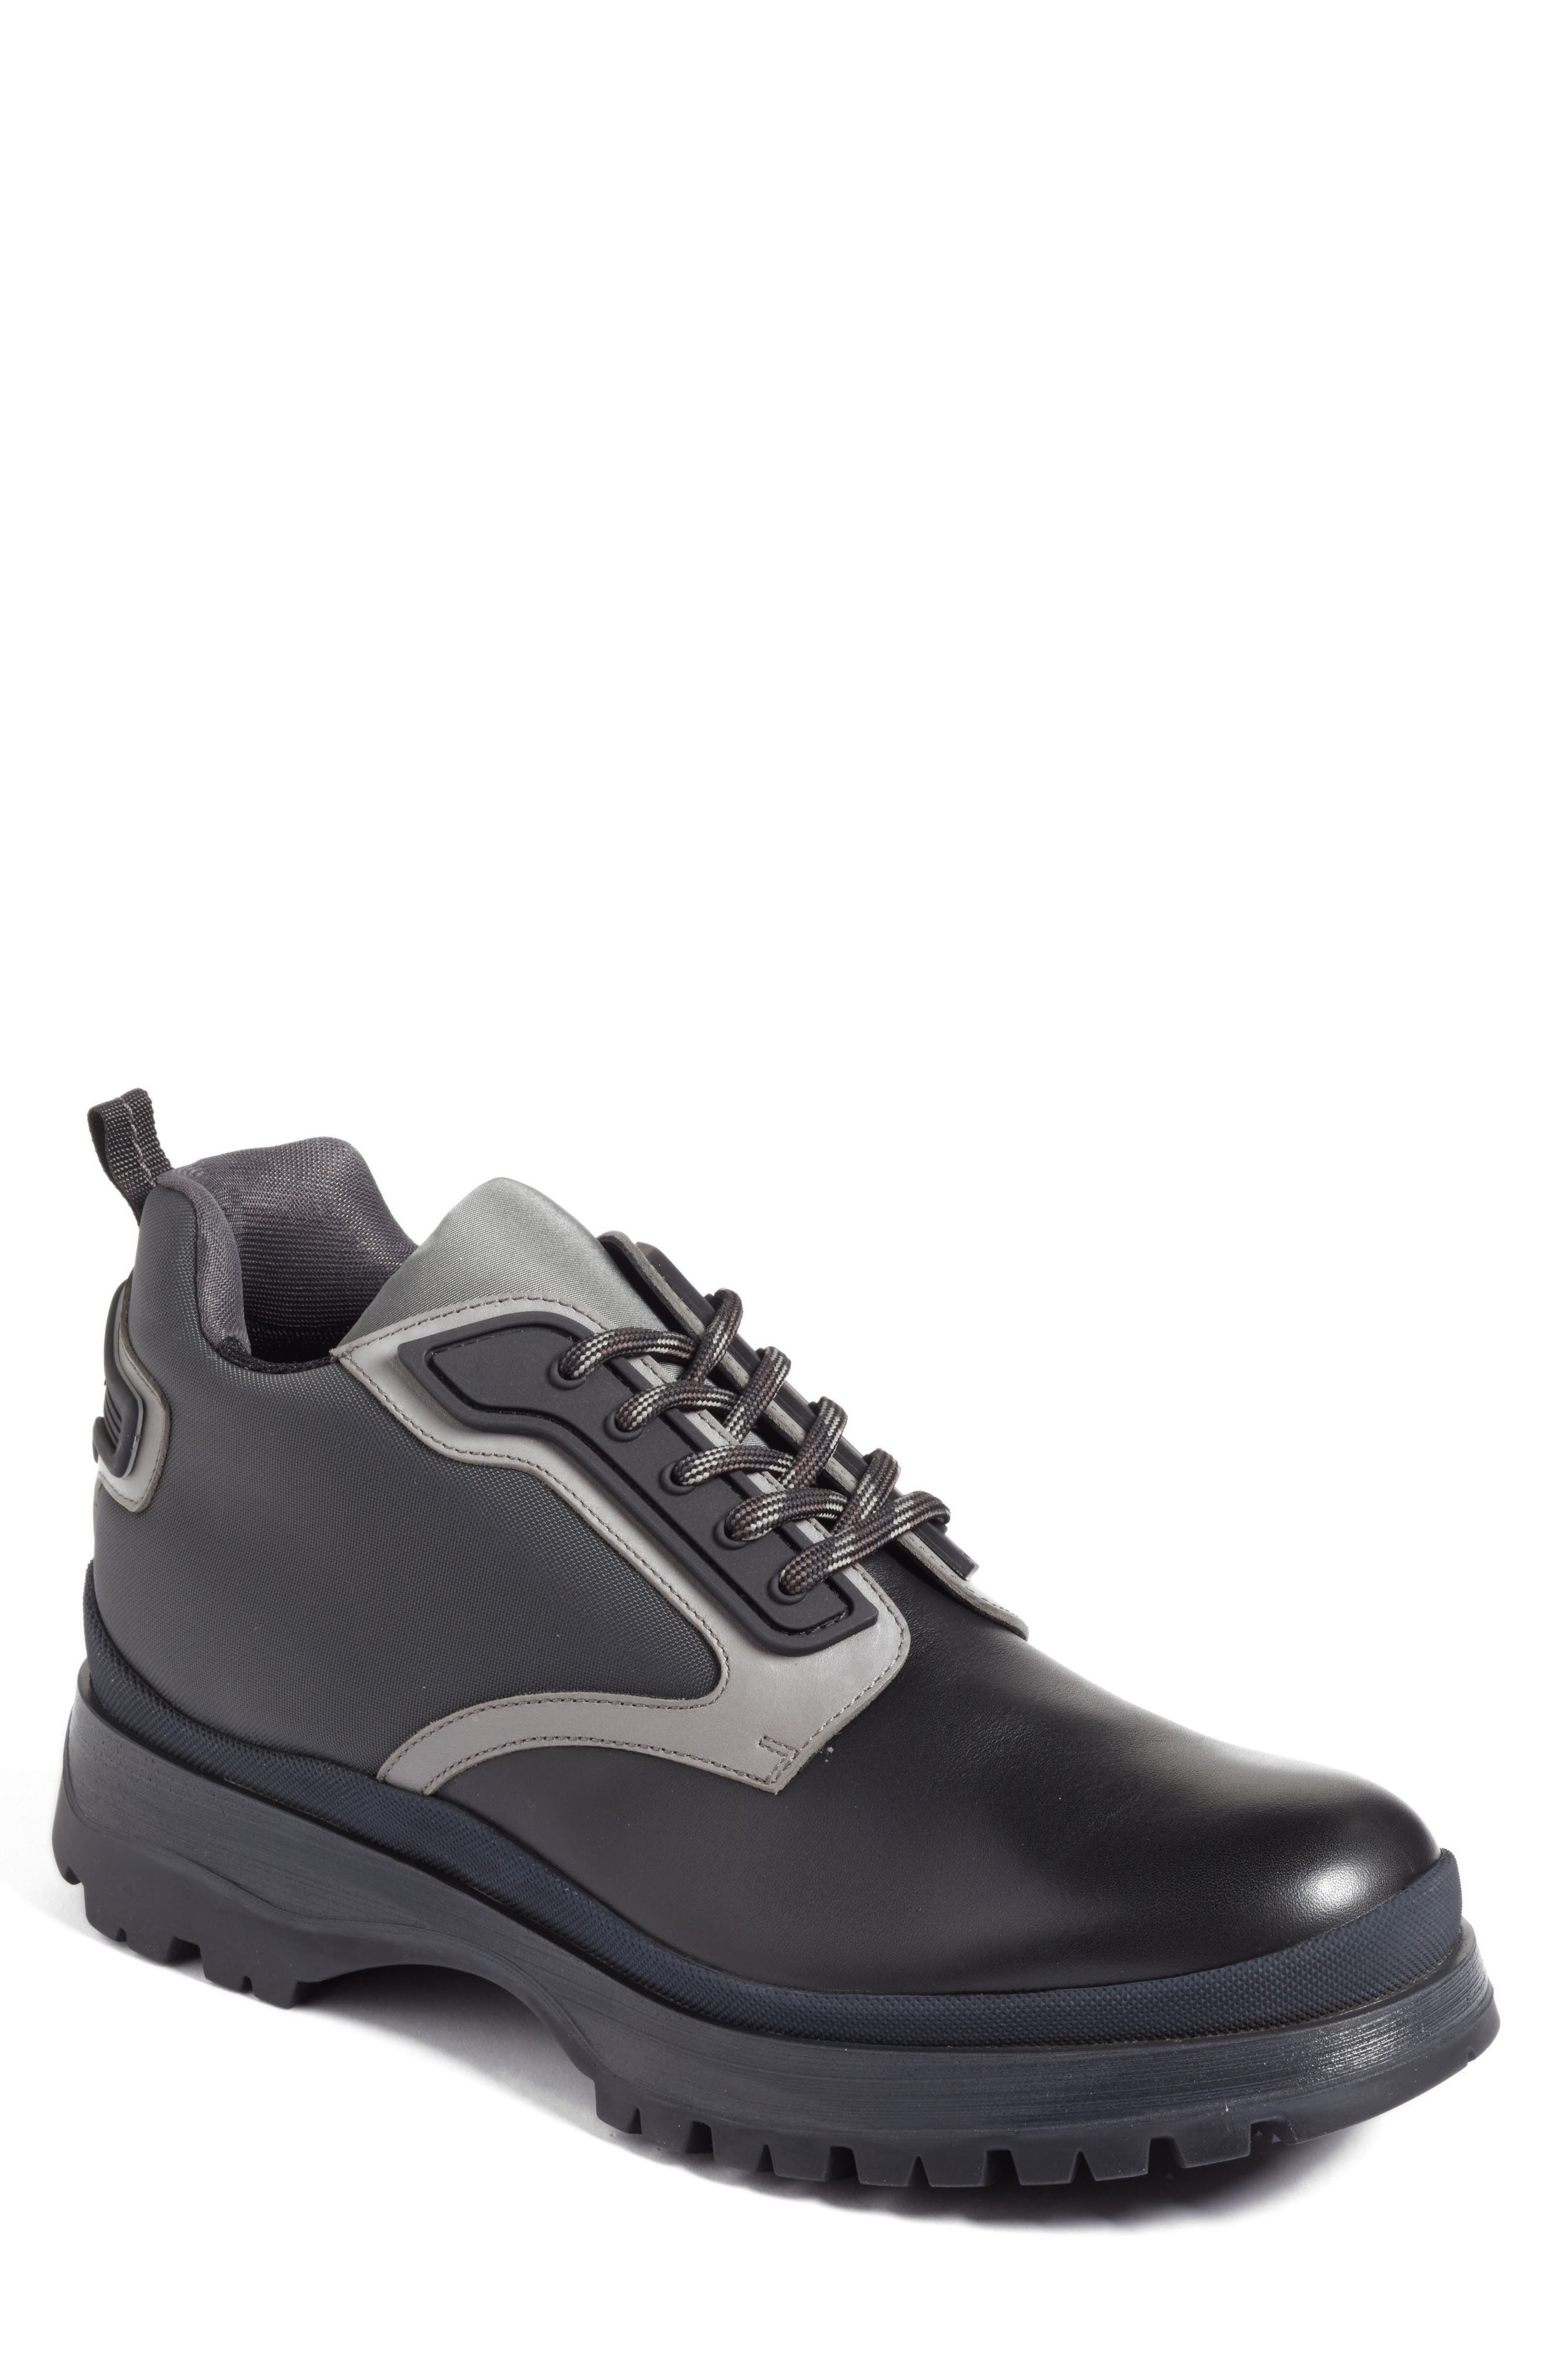 Prada Linea Rossa Tech Sneaker Boot (Men)